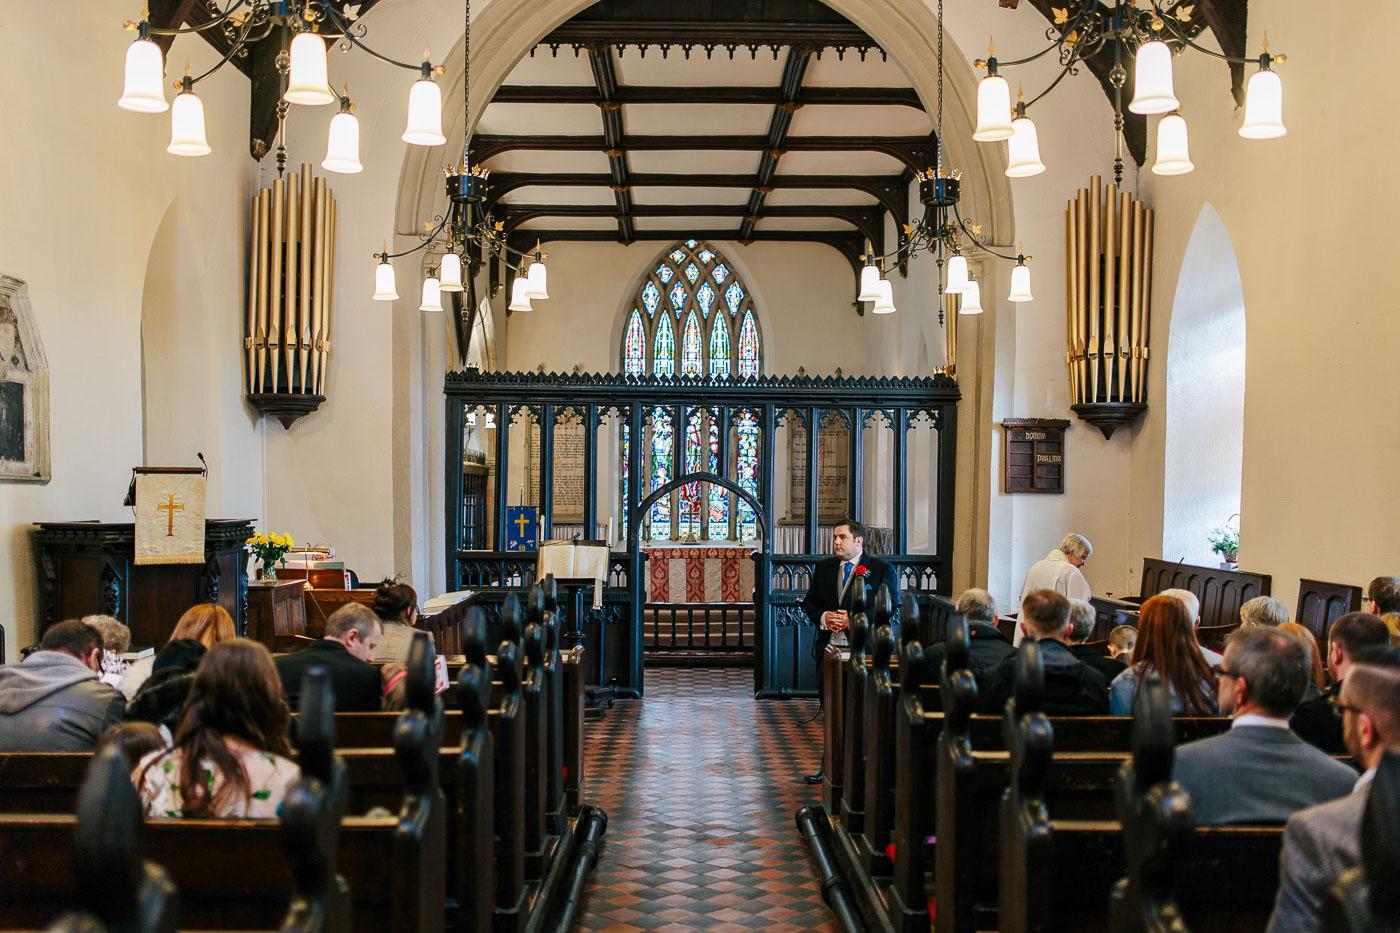 All Hallows Church in Mitton